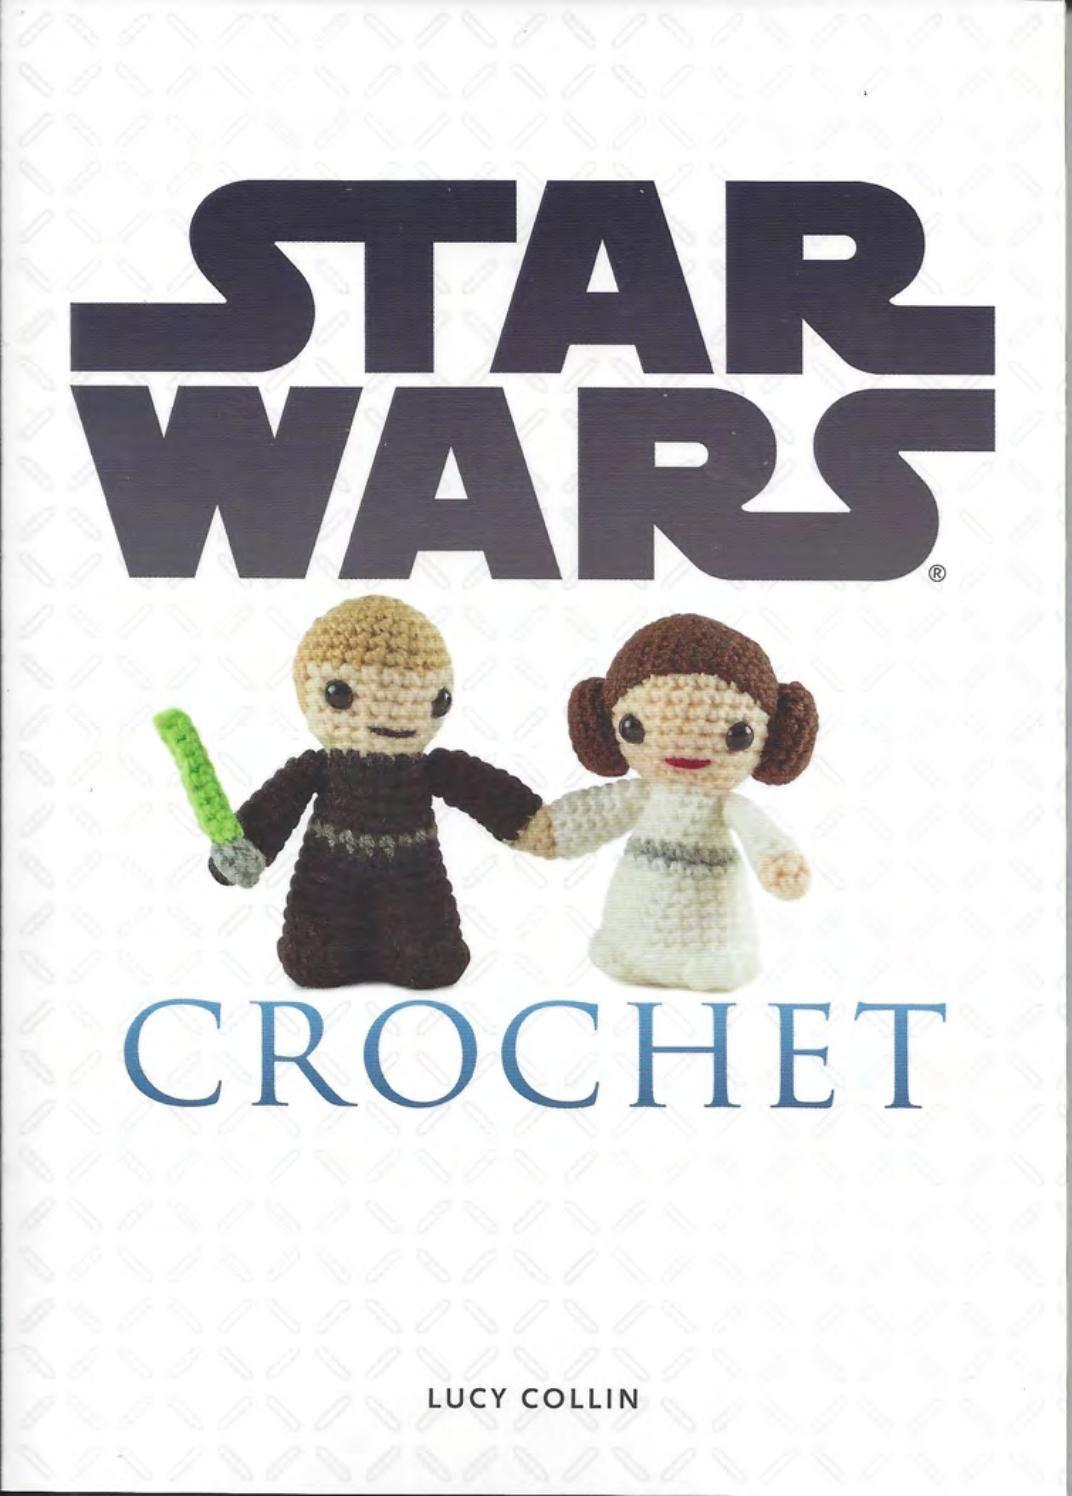 Star wars crochet lucy collin v2 | Pinterest